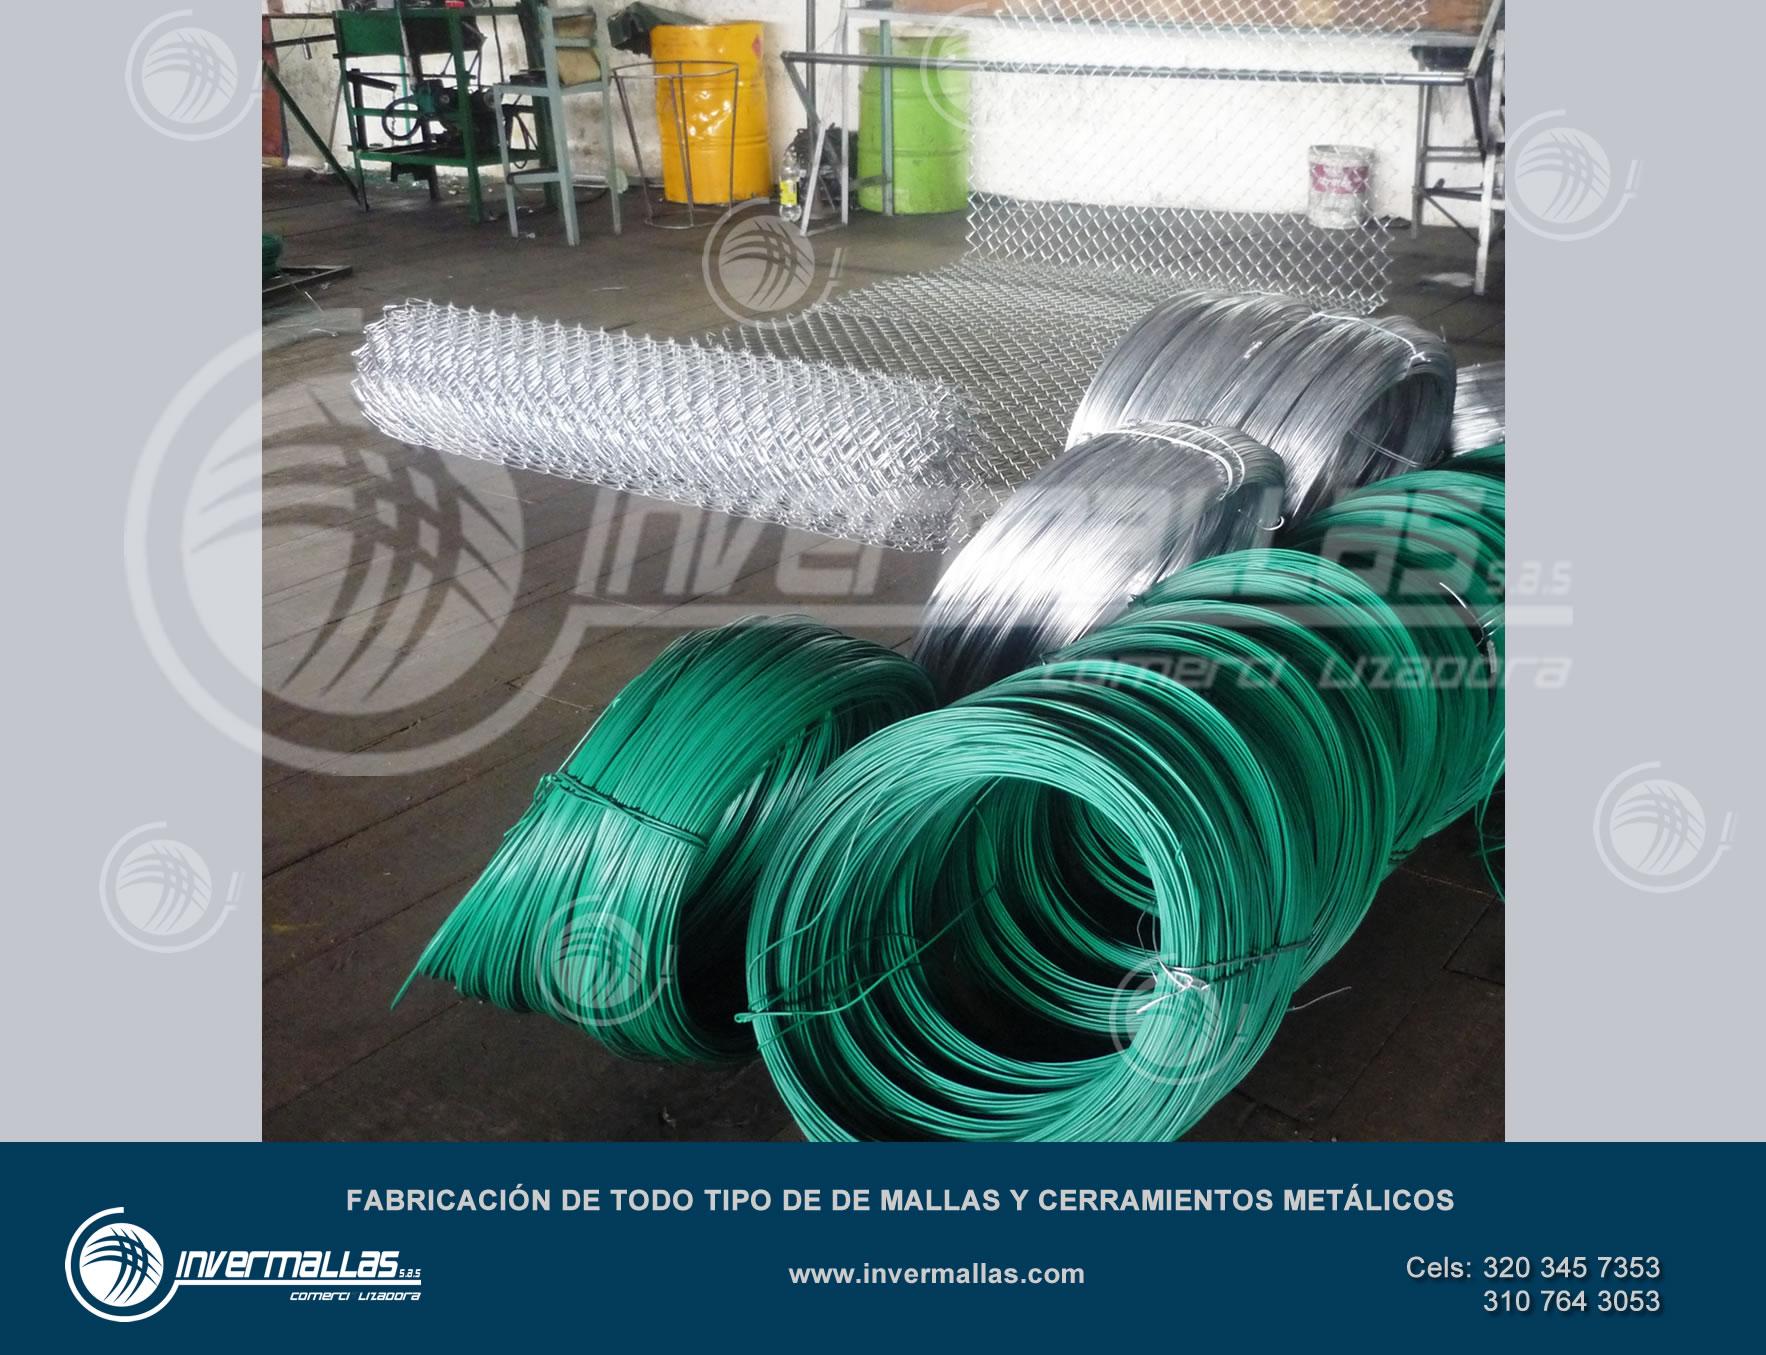 Fabricaciòn de alambre galvanizado